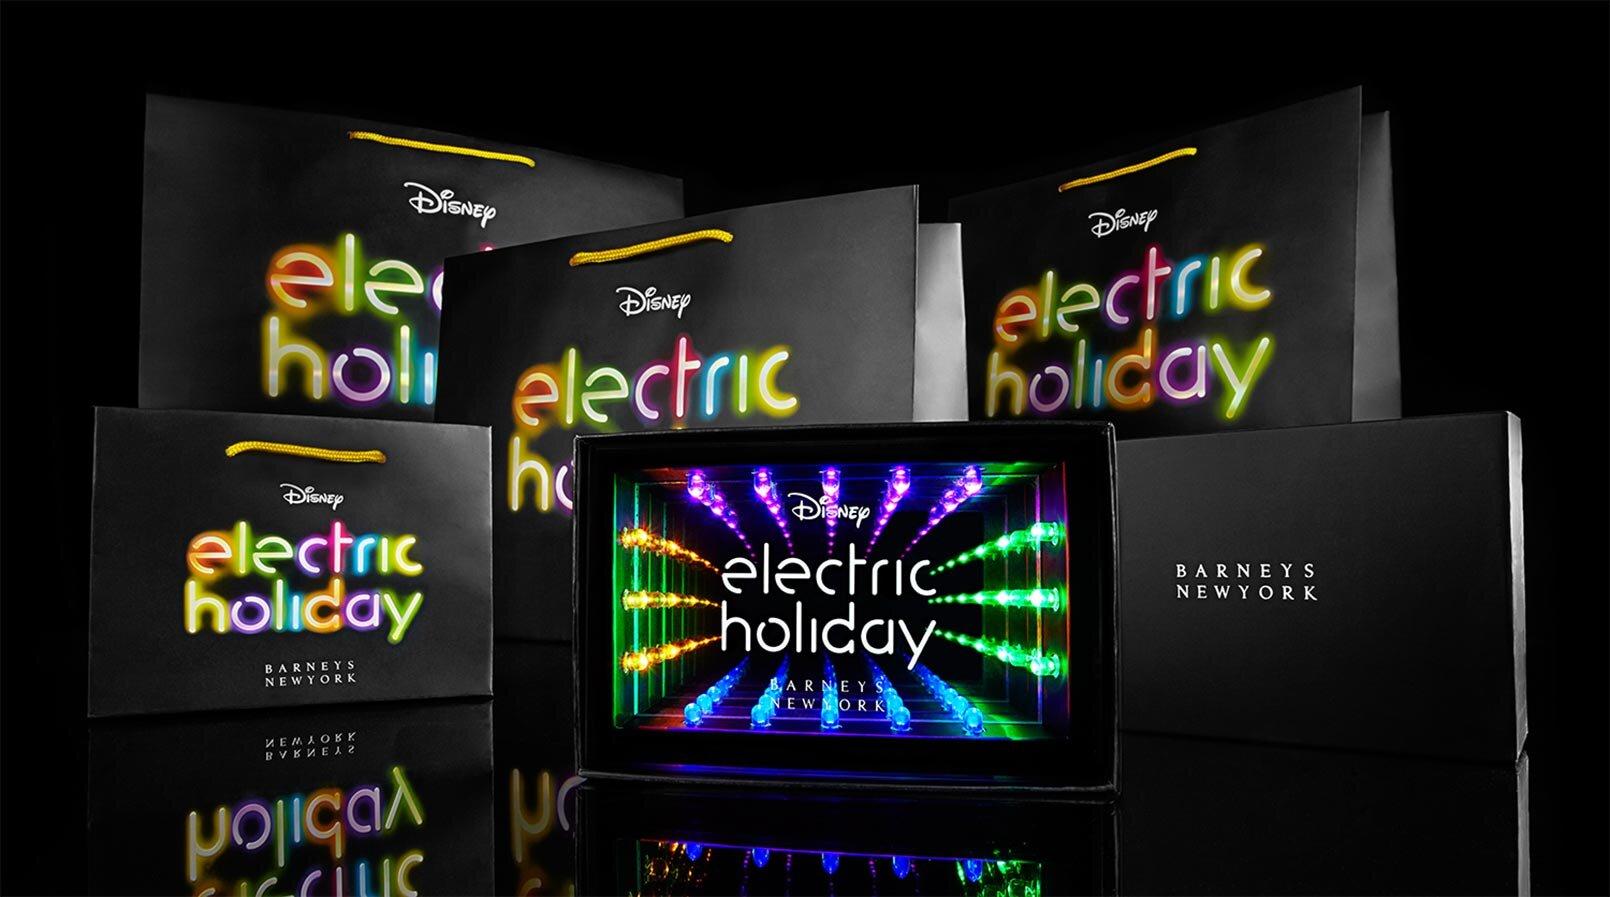 Barneys-New-York-Holiday-Disney-Holiday-Design-Design-Packaging-Company-6.JPG